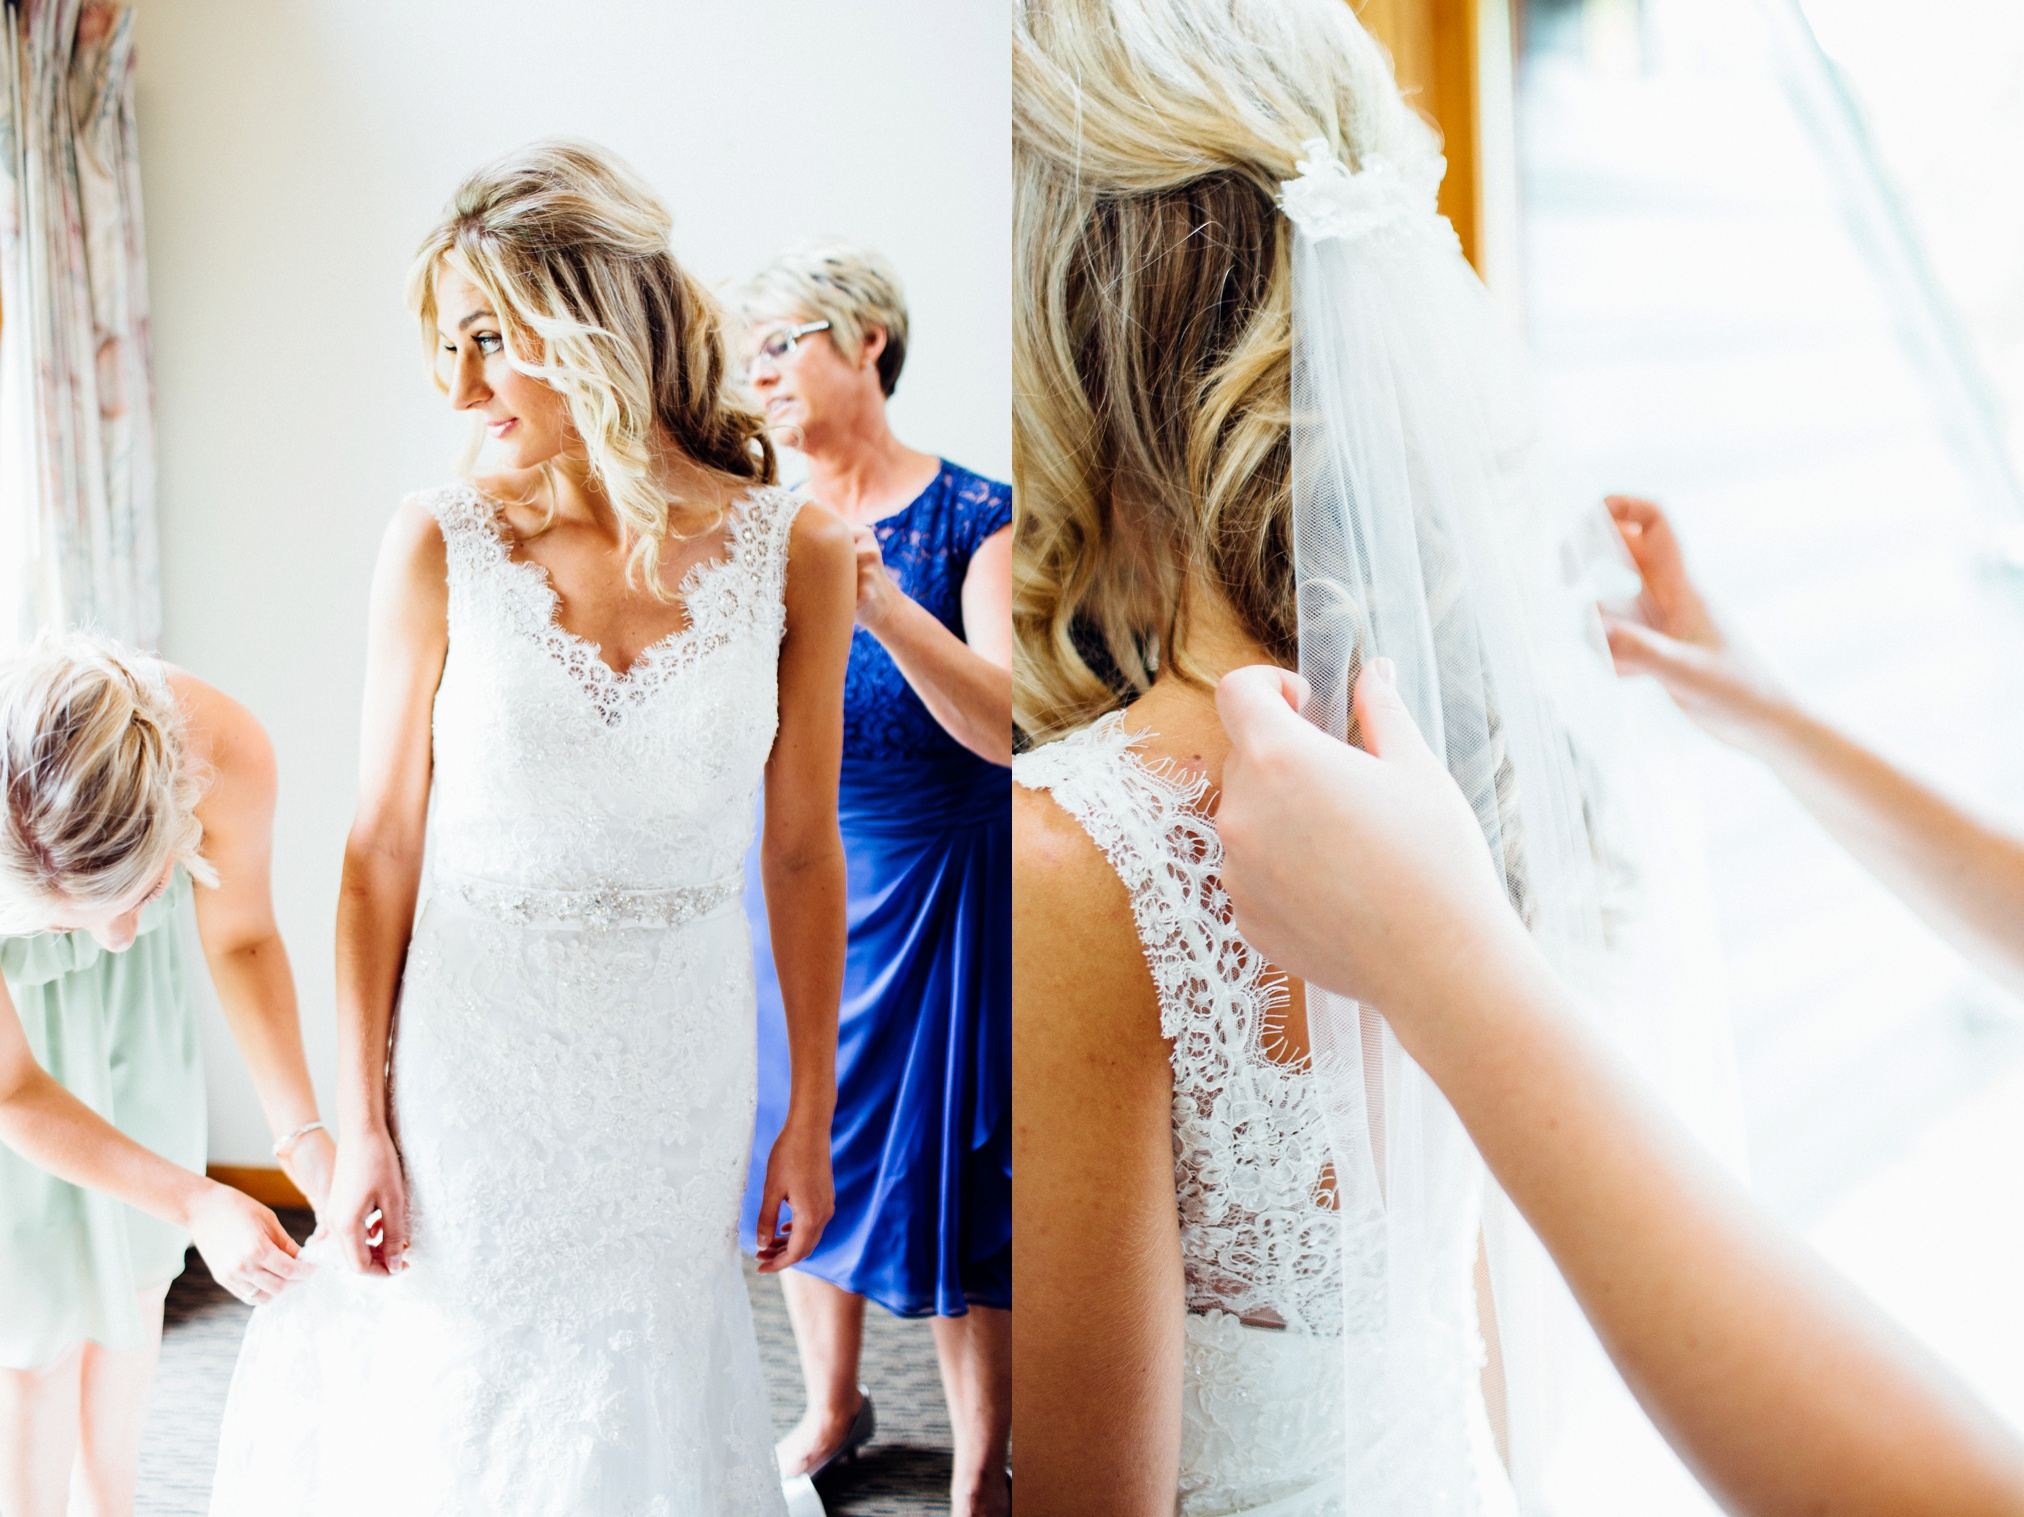 schmid_wedding-66.jpg